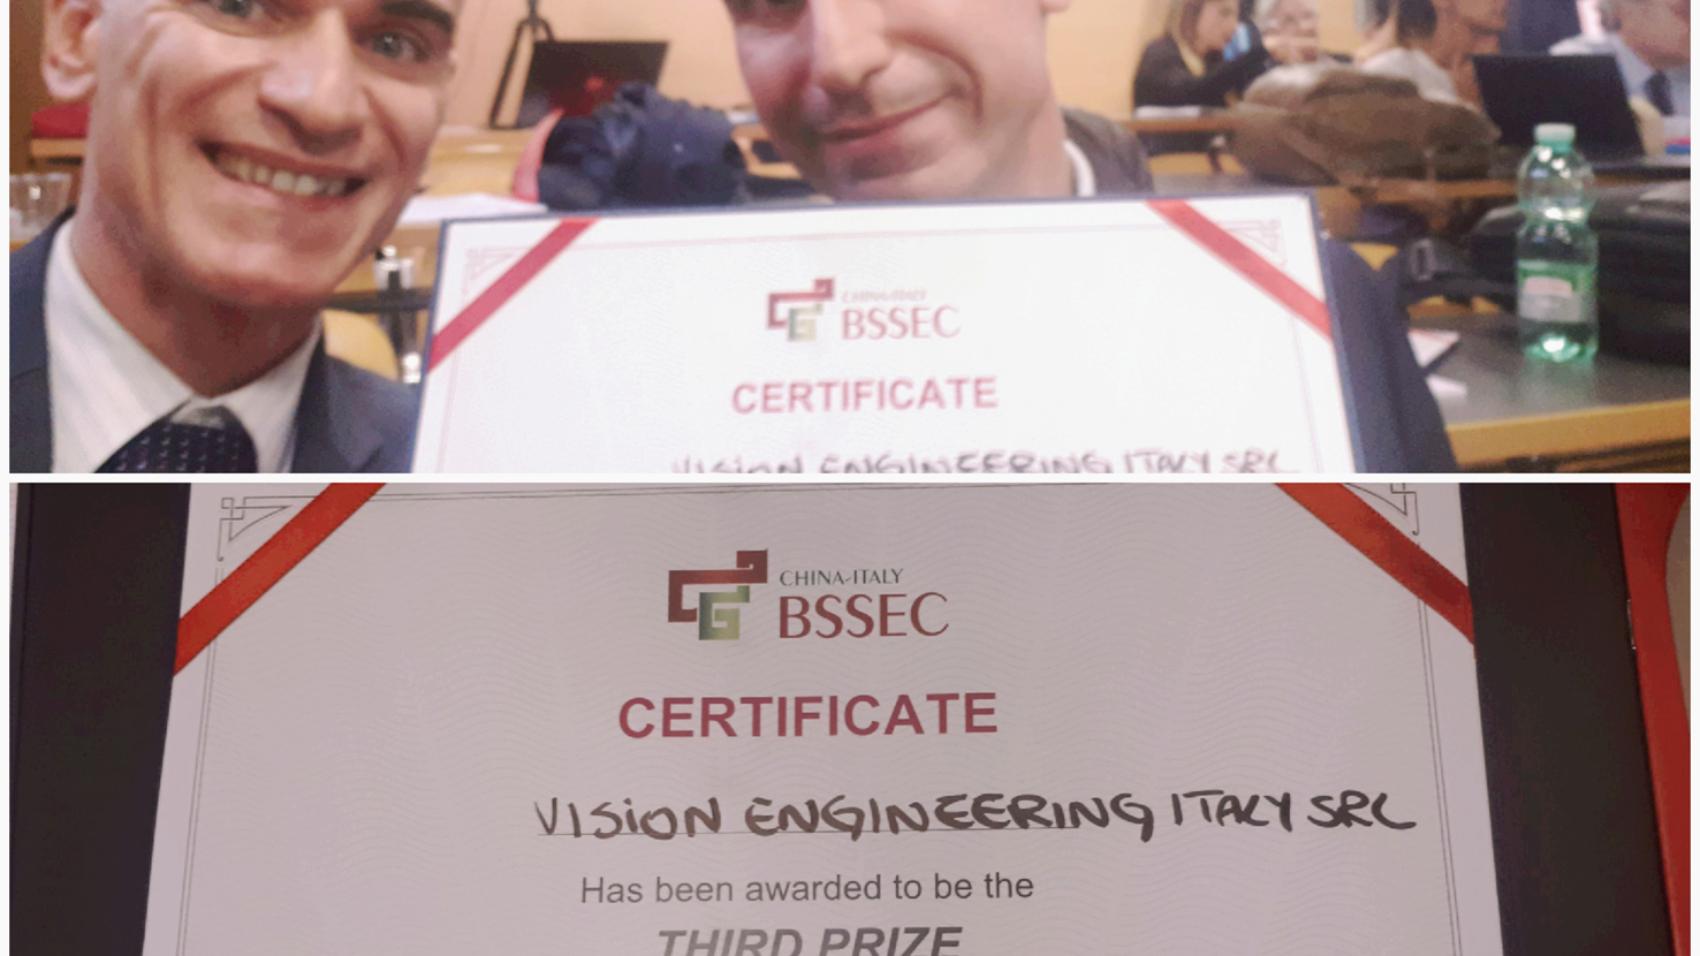 Third Prize BSSEC